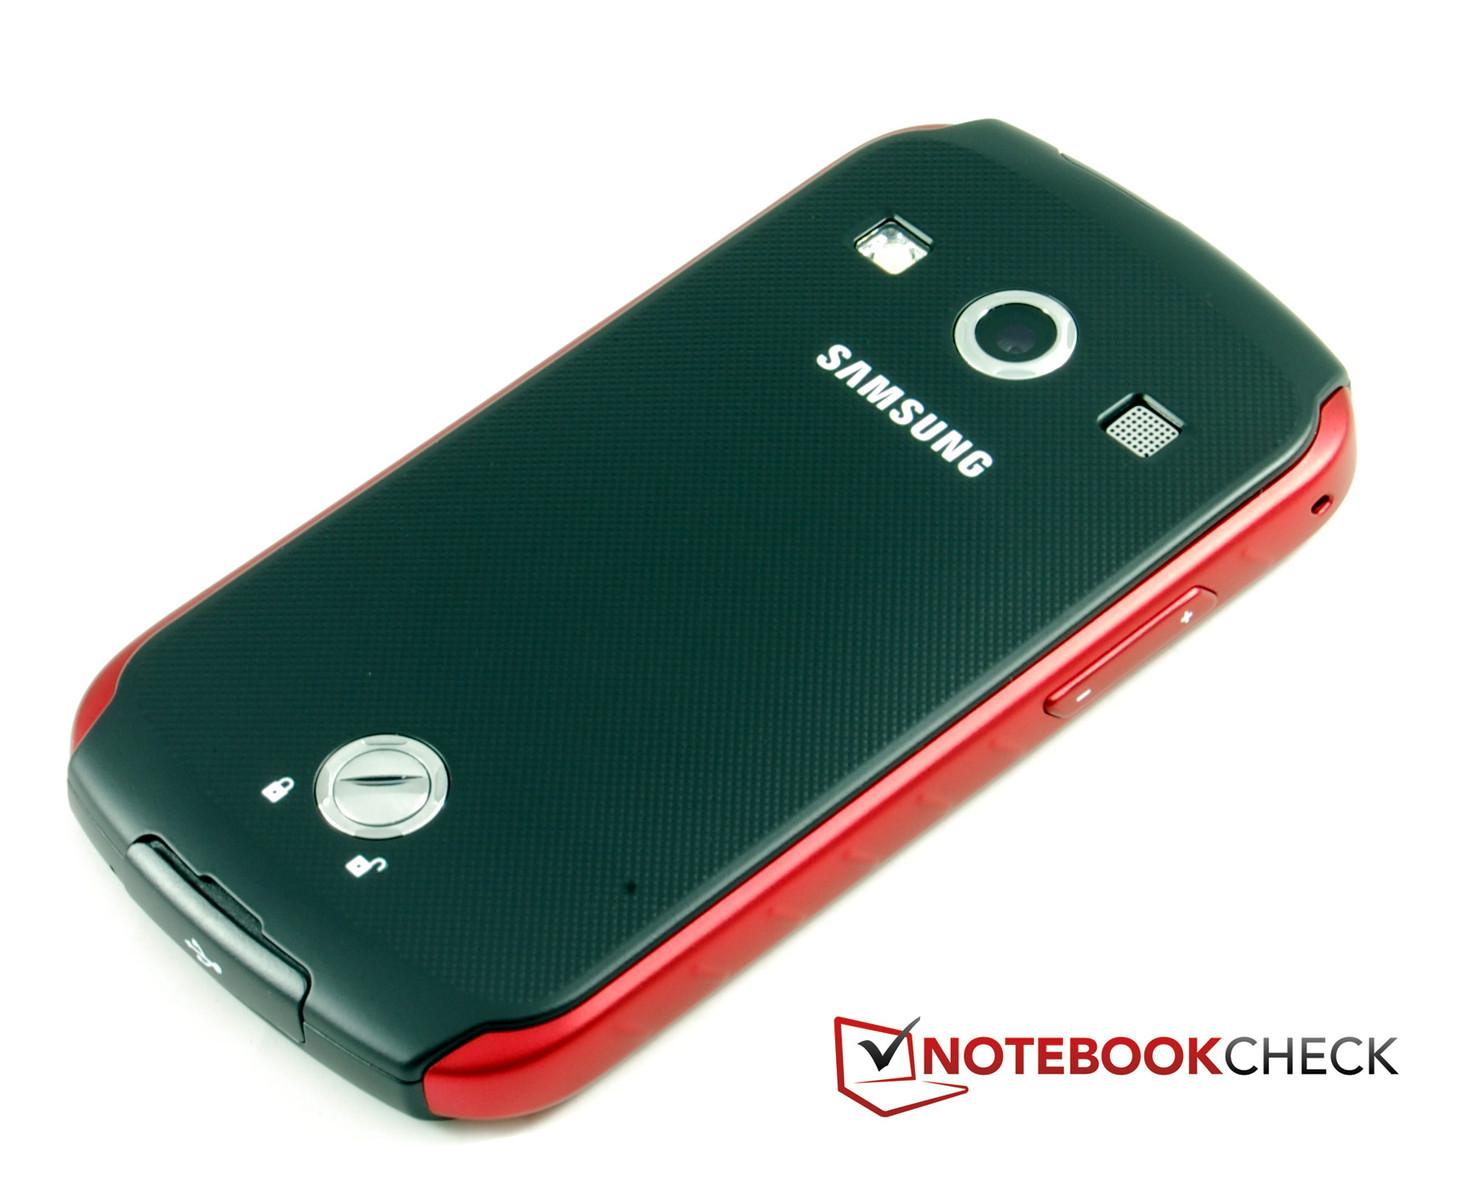 Samsung outdoor handy xcover 5